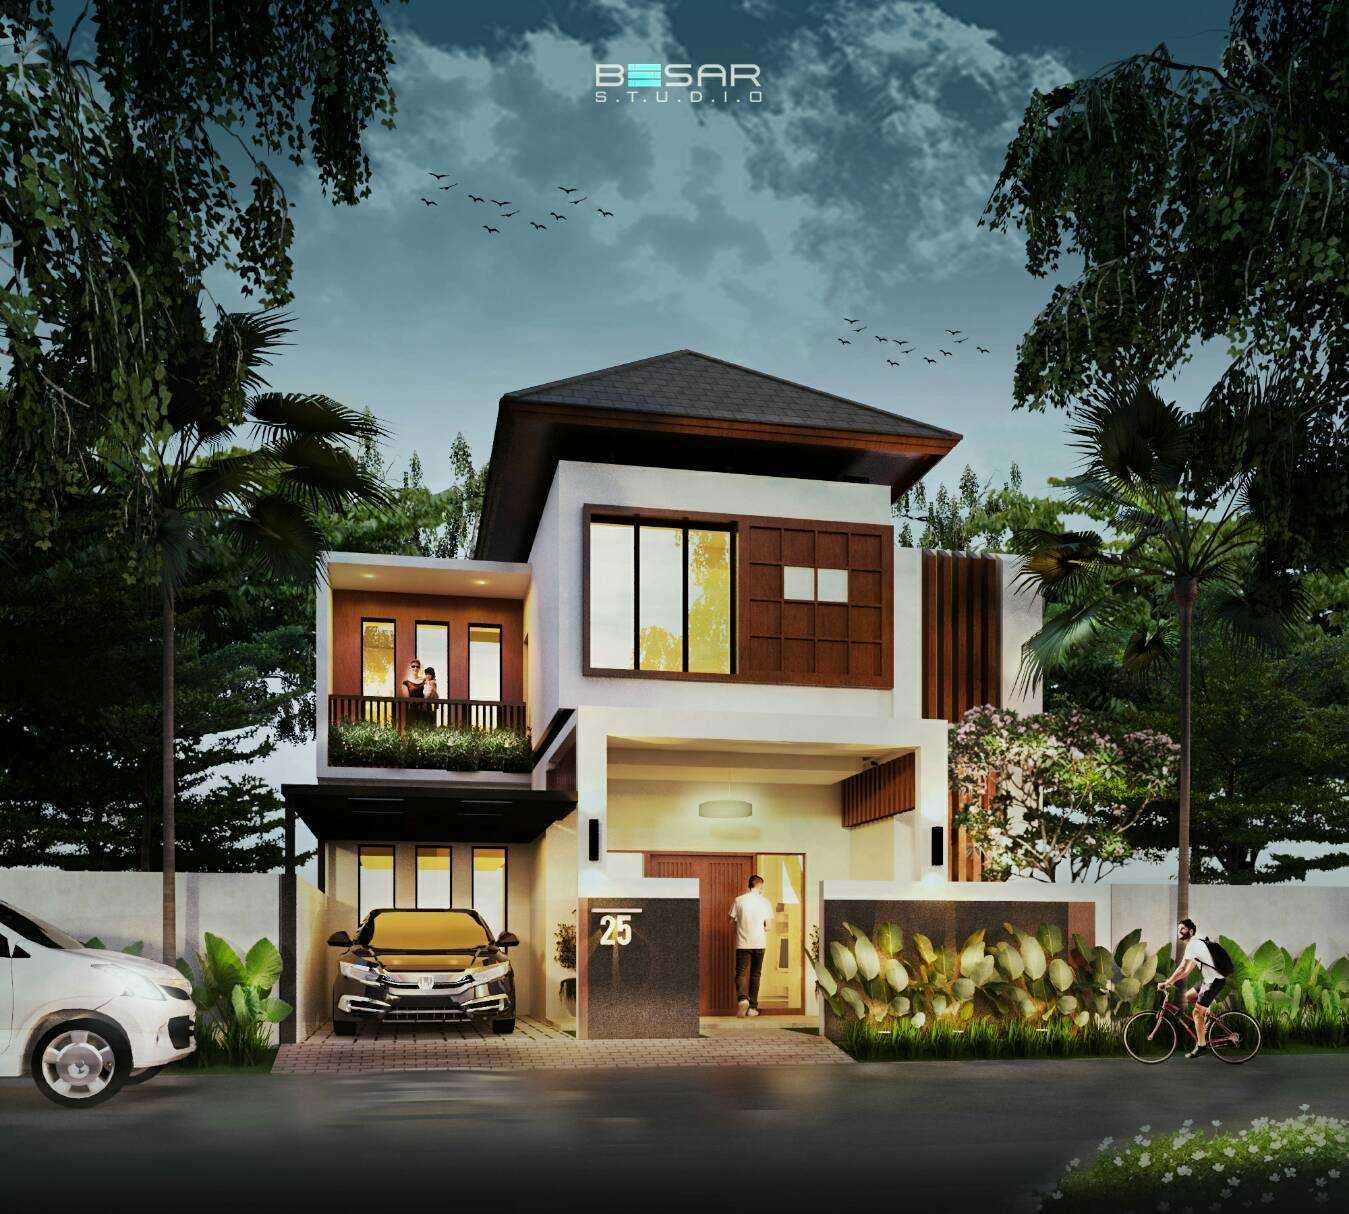 Studio Besar Cibarusah House, Cikarang Bekasi, Kota Bks, Jawa Barat, Indonesia Bekasi, Kota Bks, Jawa Barat, Indonesia 65299   36976